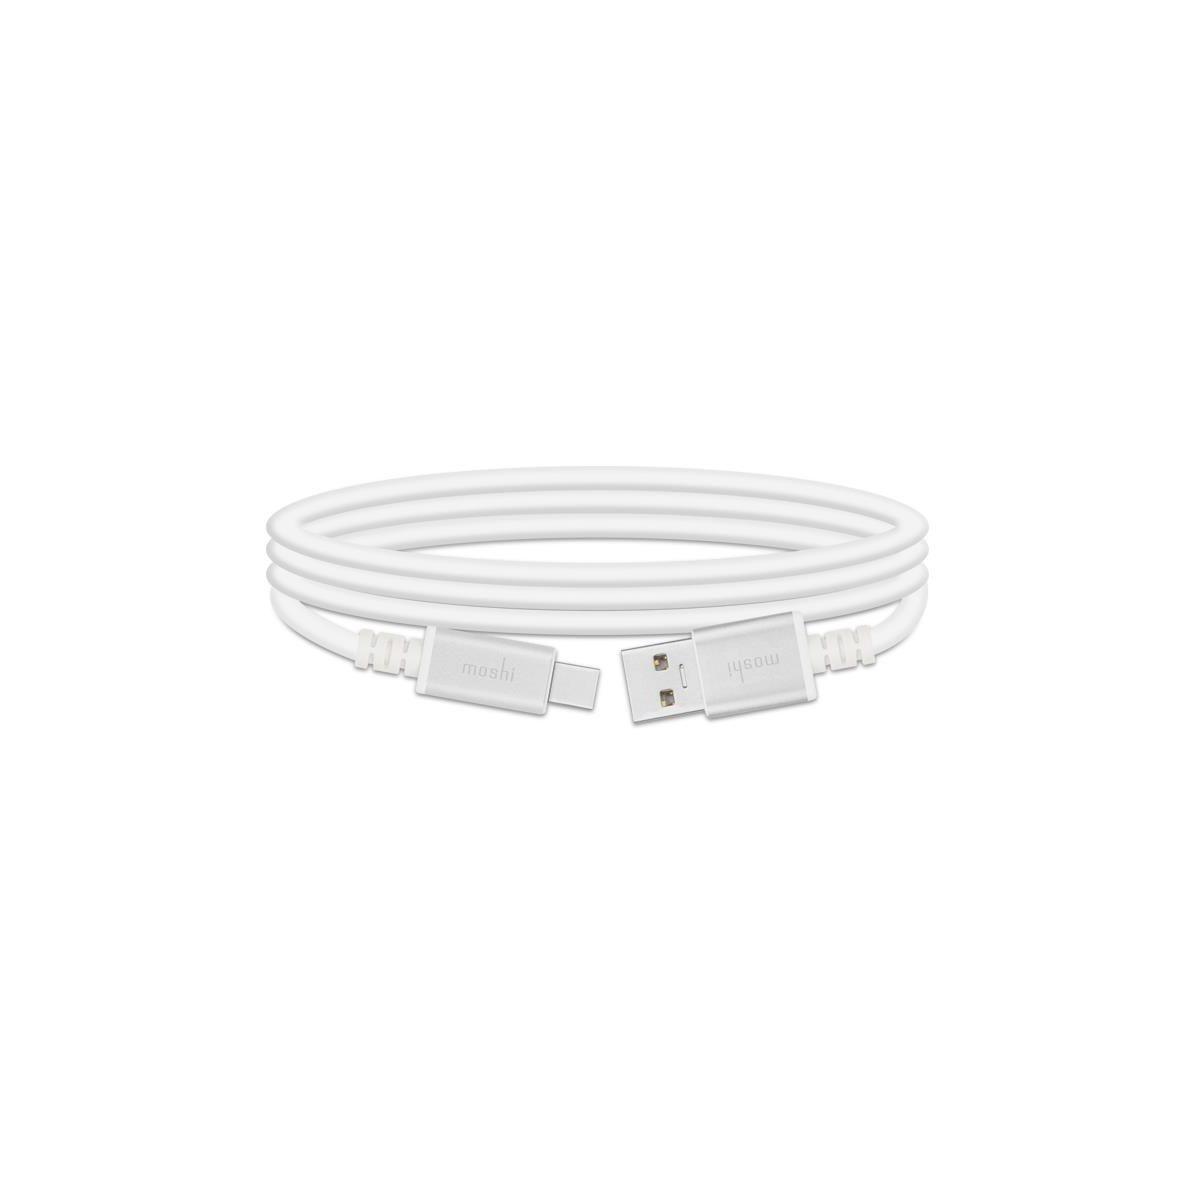 Adaptateur moshi usb-c v/ câble usb (photo)